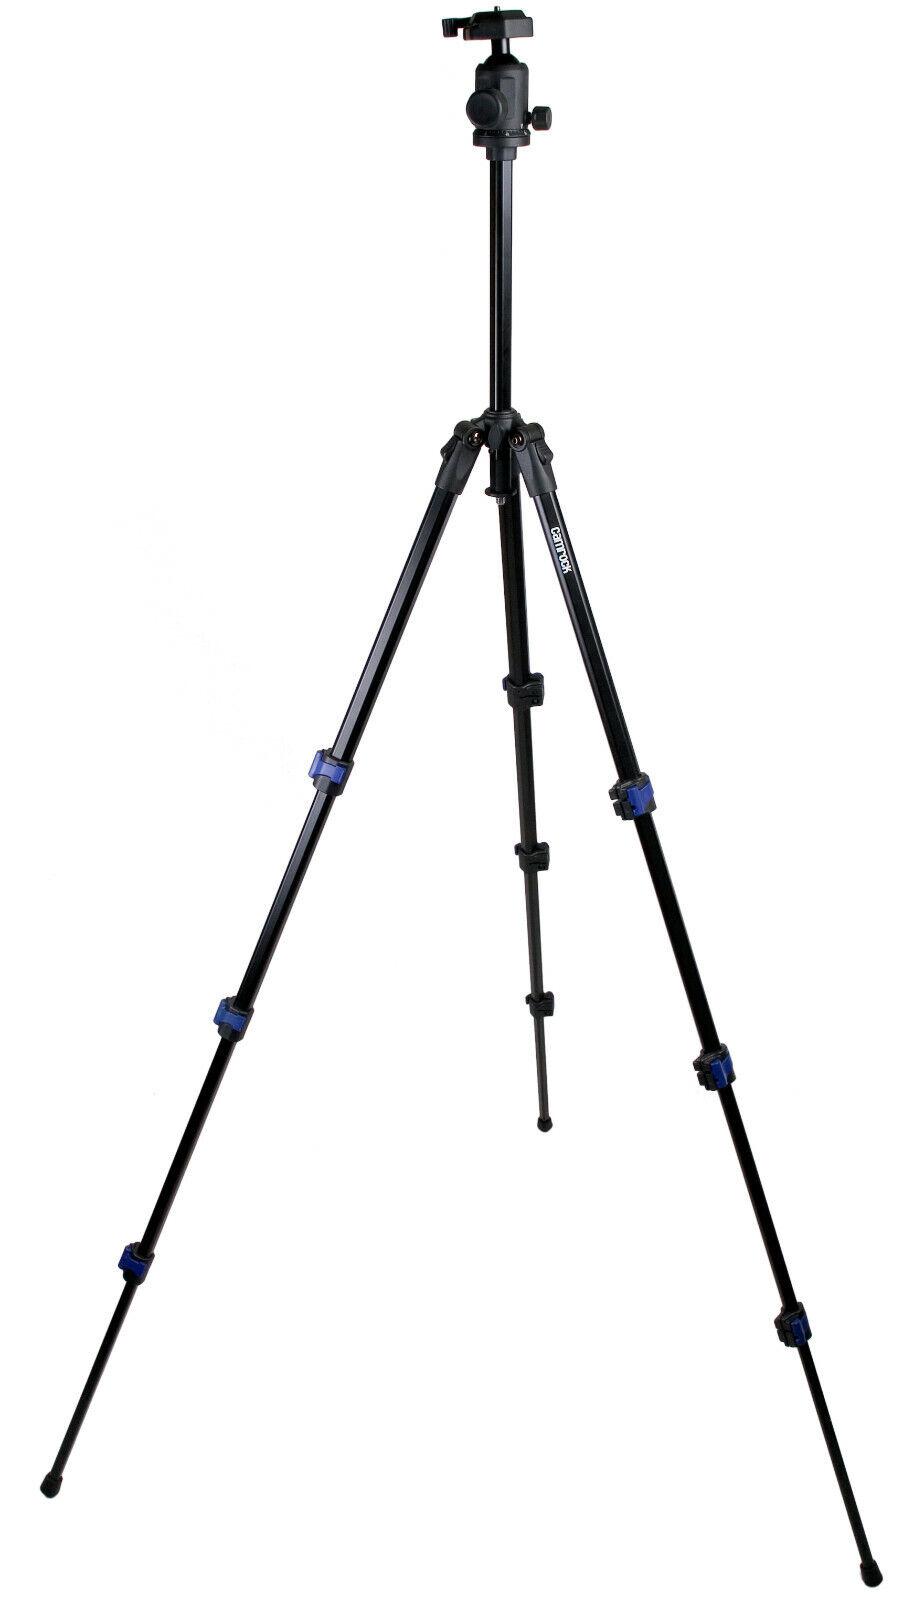 Stativ Tripod Dreibeinstativ Camrock TS53 für Fuji Olympus Panasonic Kameras